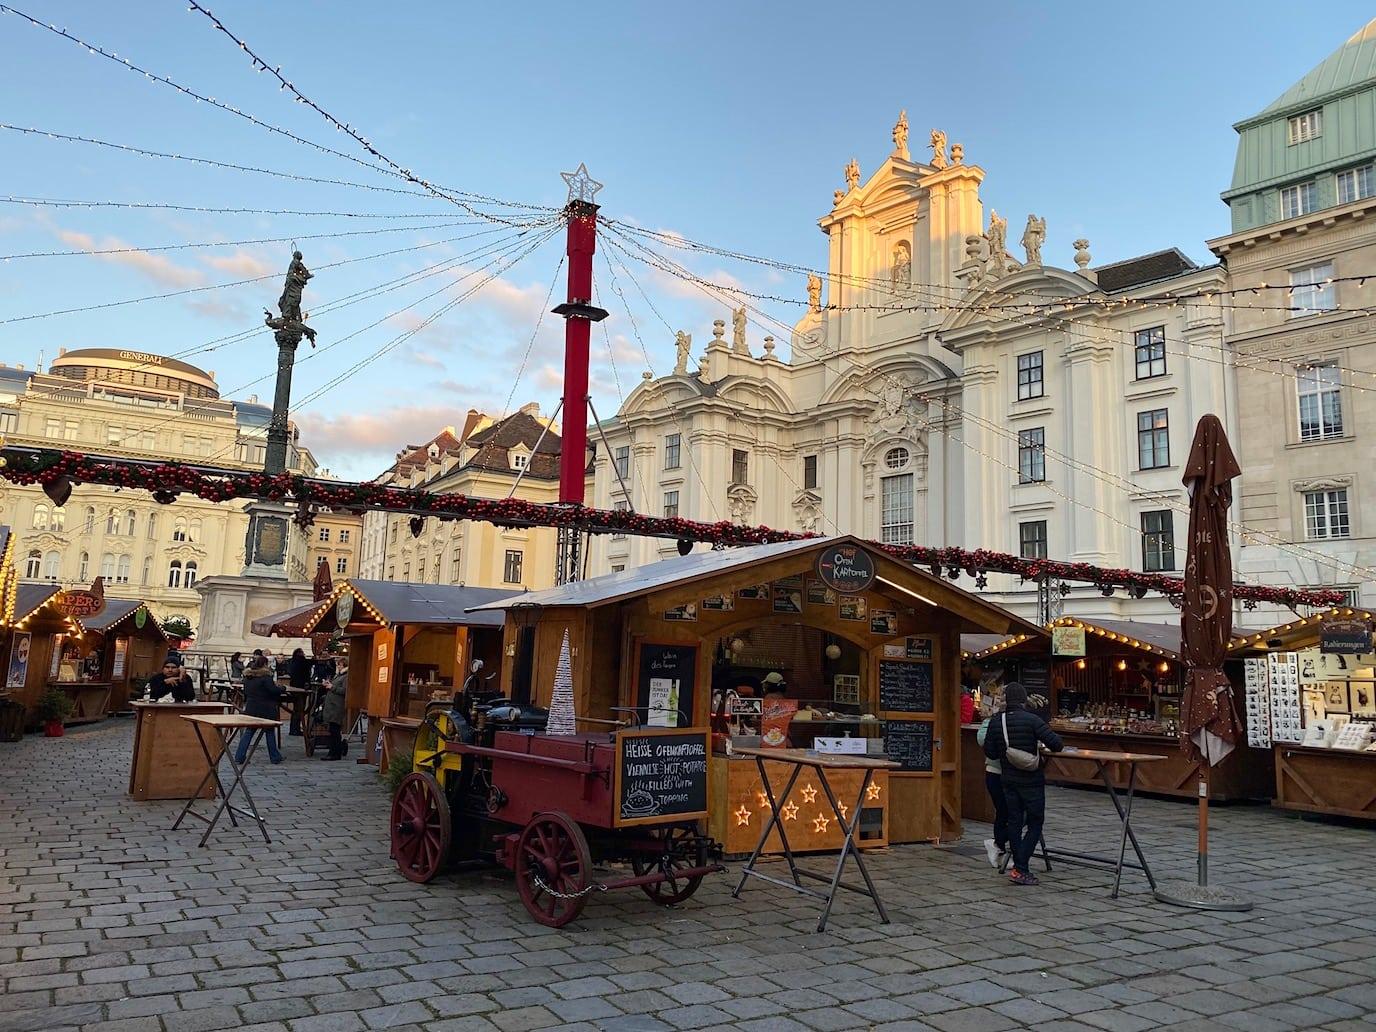 Christmas market at Am Hof